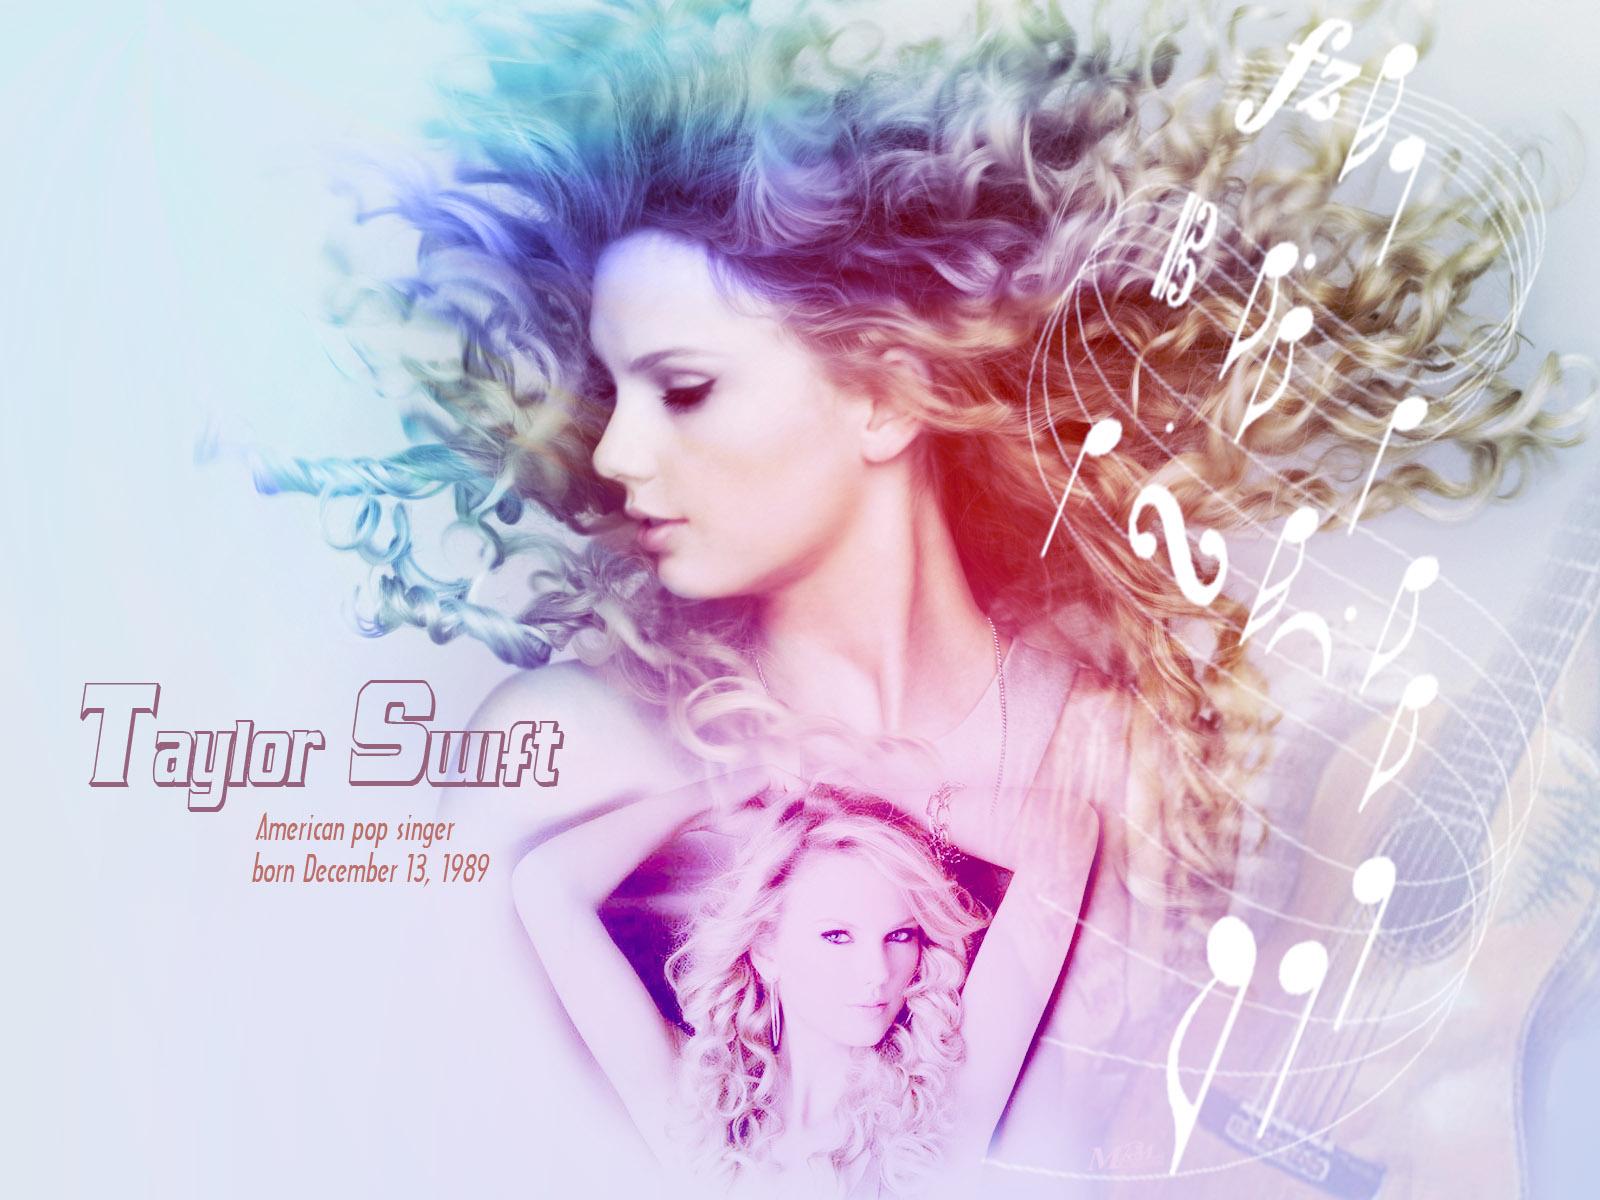 http://1.bp.blogspot.com/-XsUy9tPuI7A/UAJFcNYuZEI/AAAAAAAAAAs/HUTfACl_2_c/s1600/Taylor-Swift-Wallpapers-Latest-6.jpg